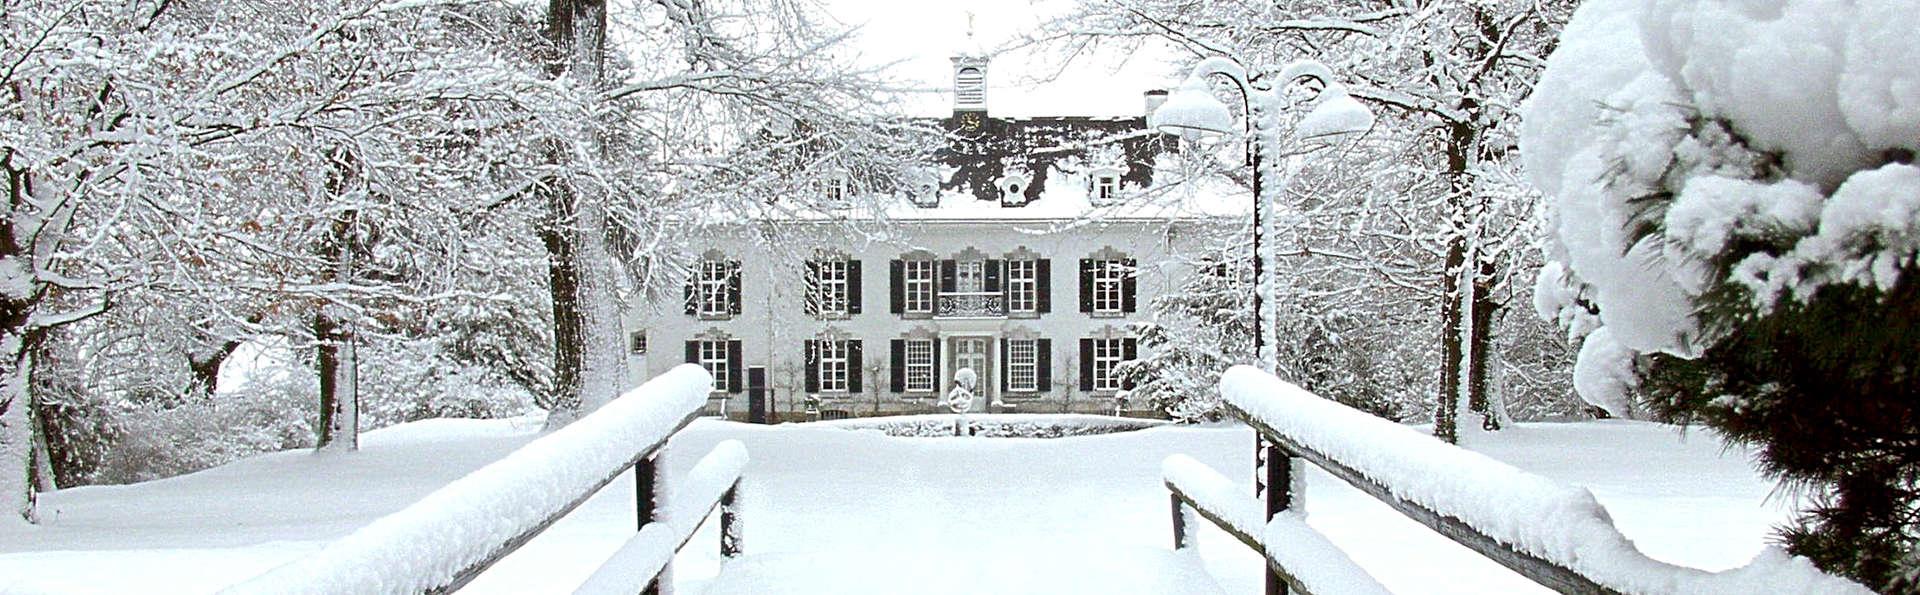 Bilderberg Kasteel Vaalsbroek  - EDIT_NEW_SNOW.jpg